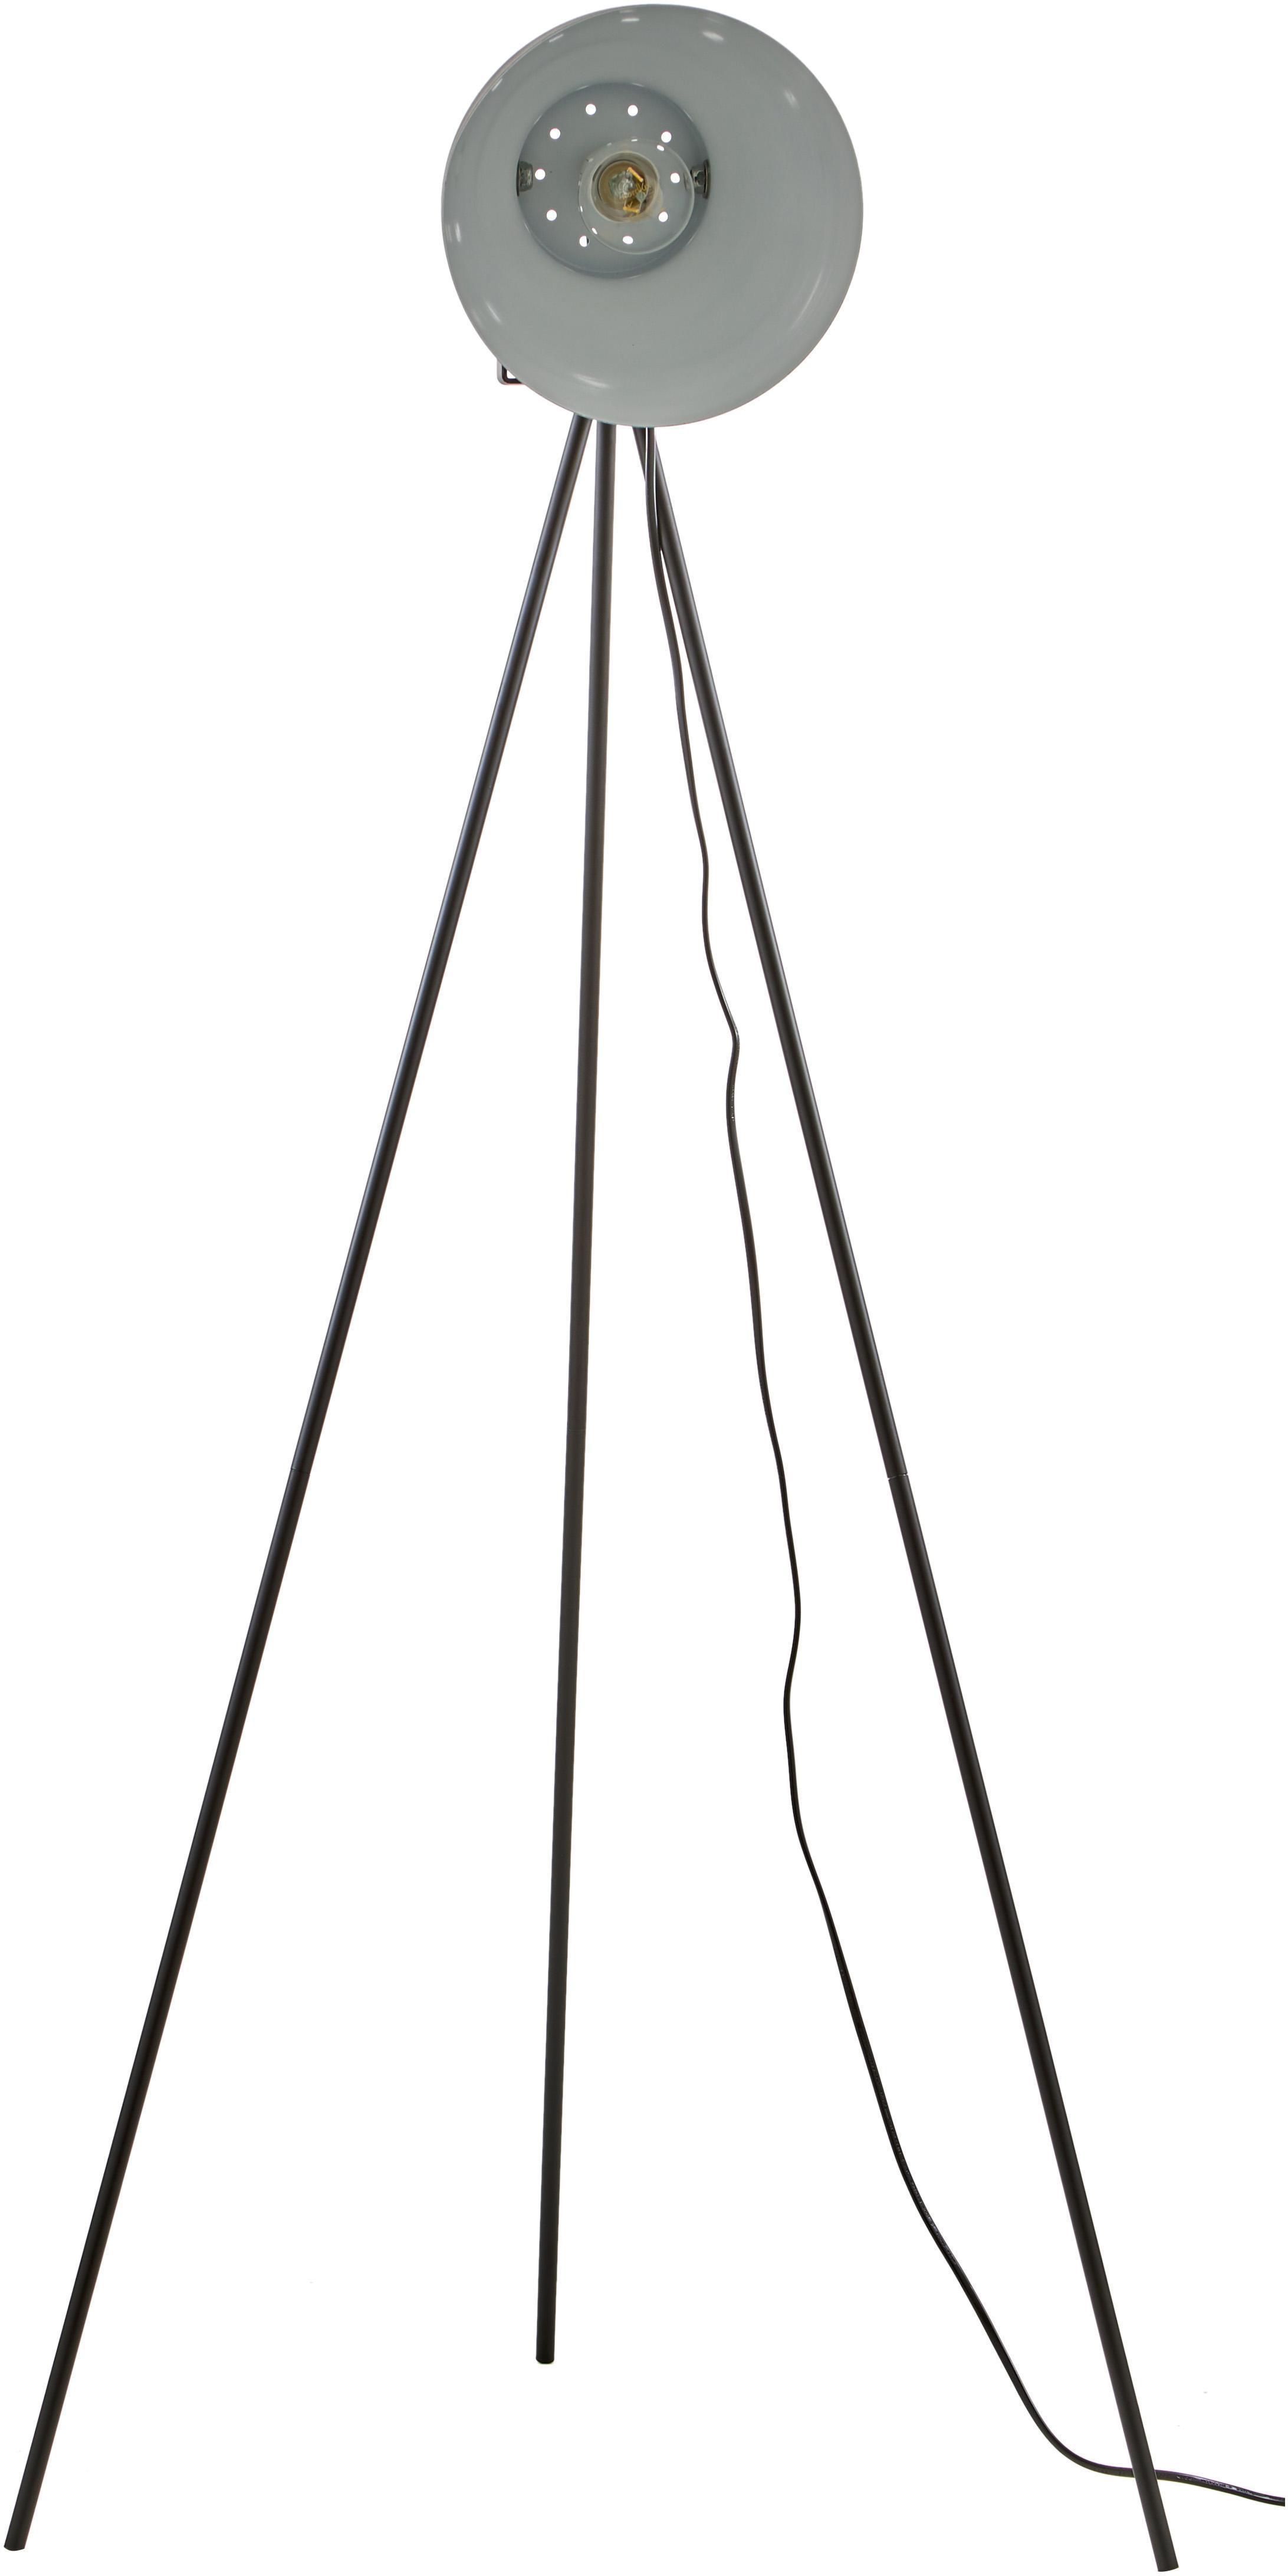 Lampada da terra industriale Studio, Acciaio, Nero opaco, Larg. 58 x Alt. 130 cm